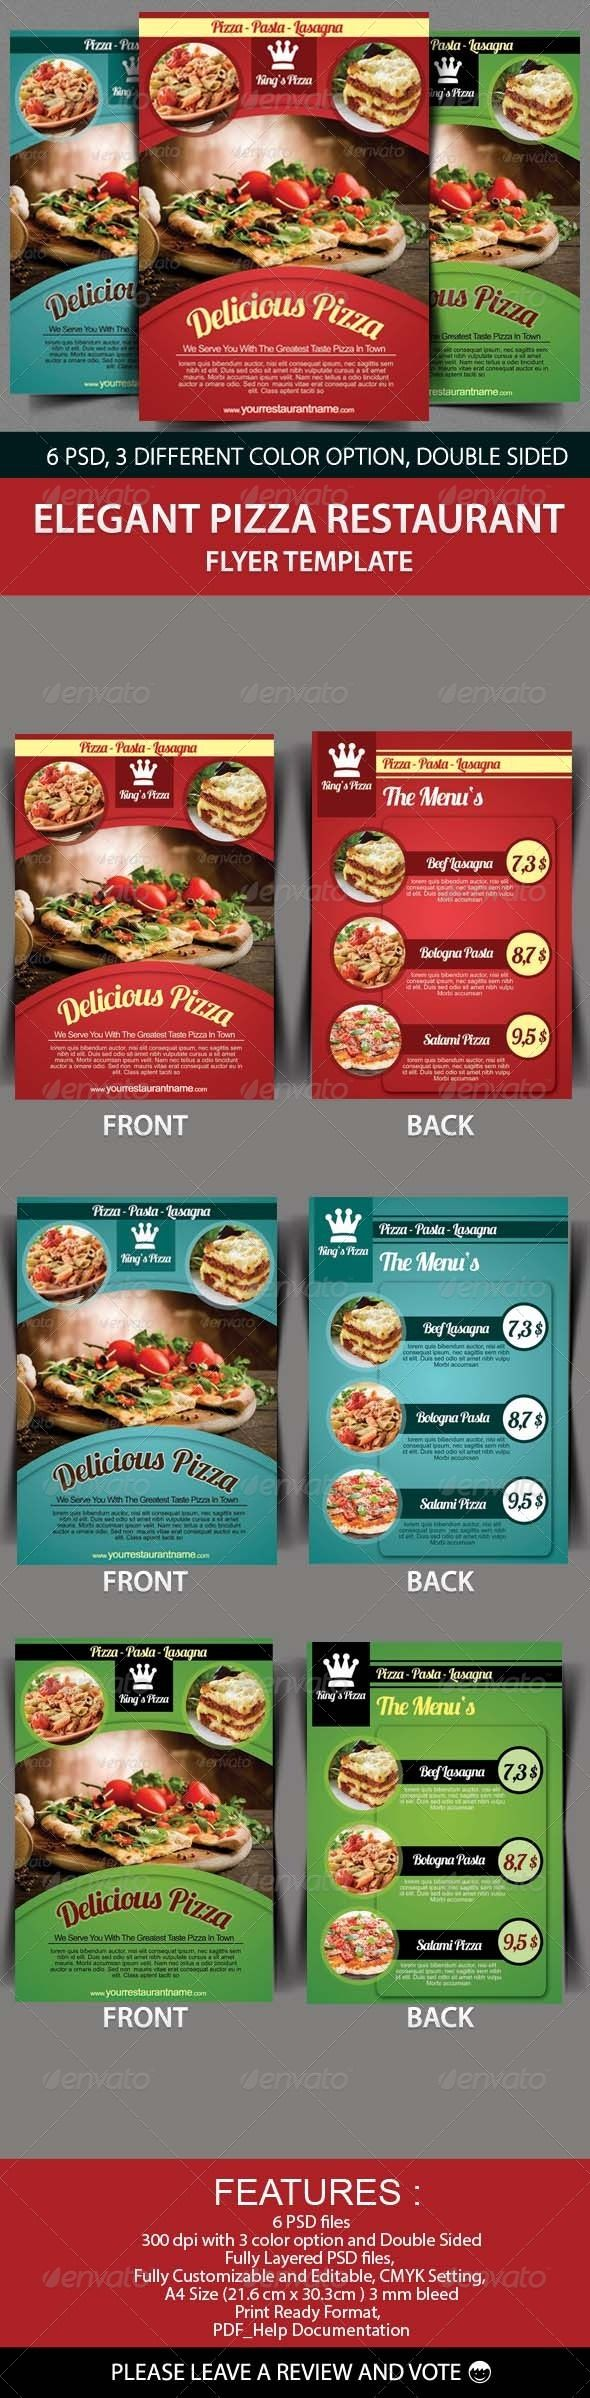 Elegant Pizza Restaurant Flyer Template - Restaurant Flyers